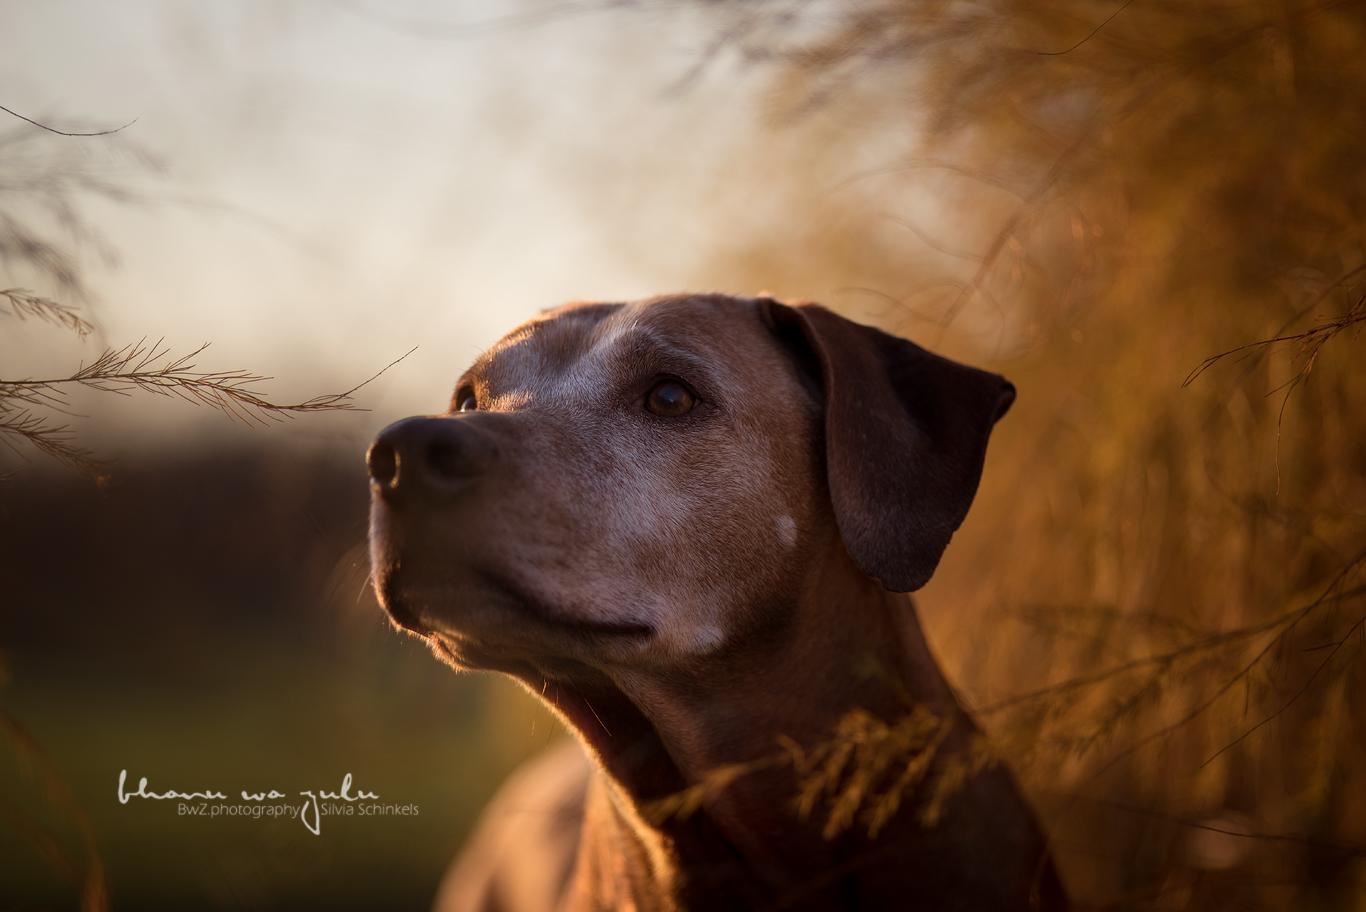 Tierfotografie nwr by BwZ.photography, Equipment